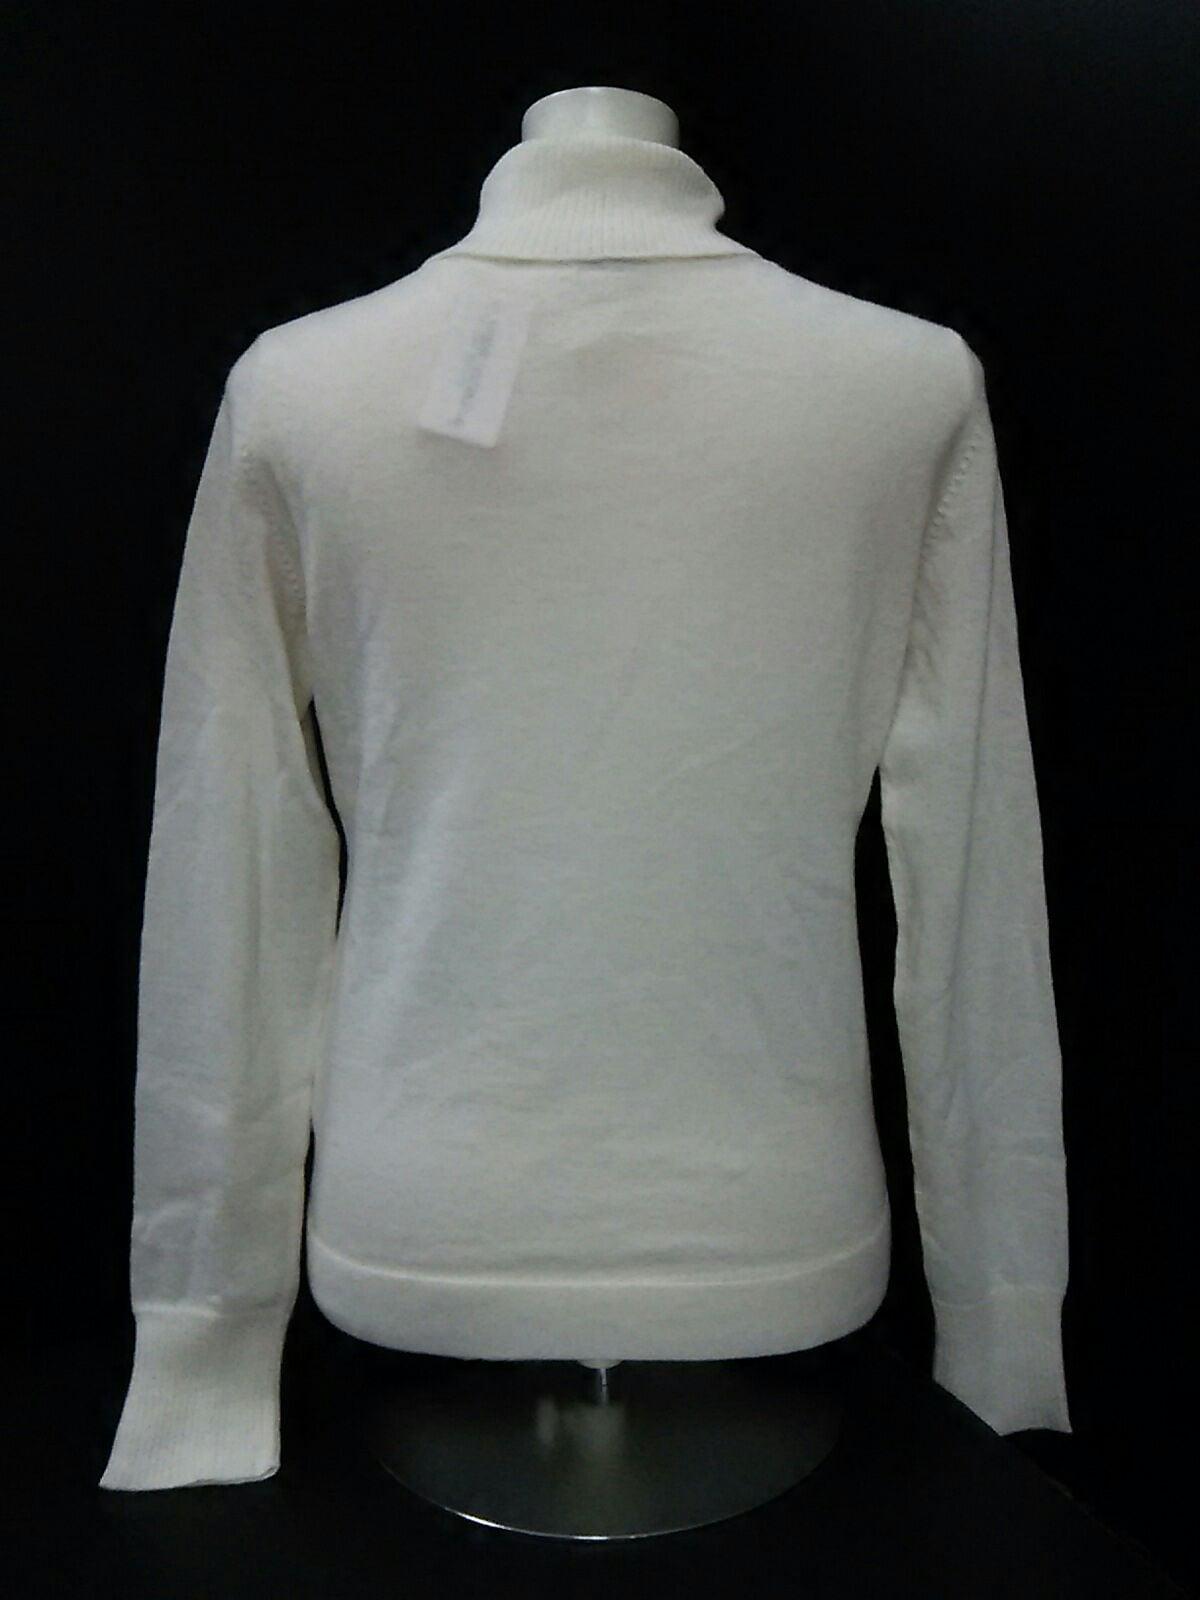 anne-monnet(アンヌモネ)のセーター